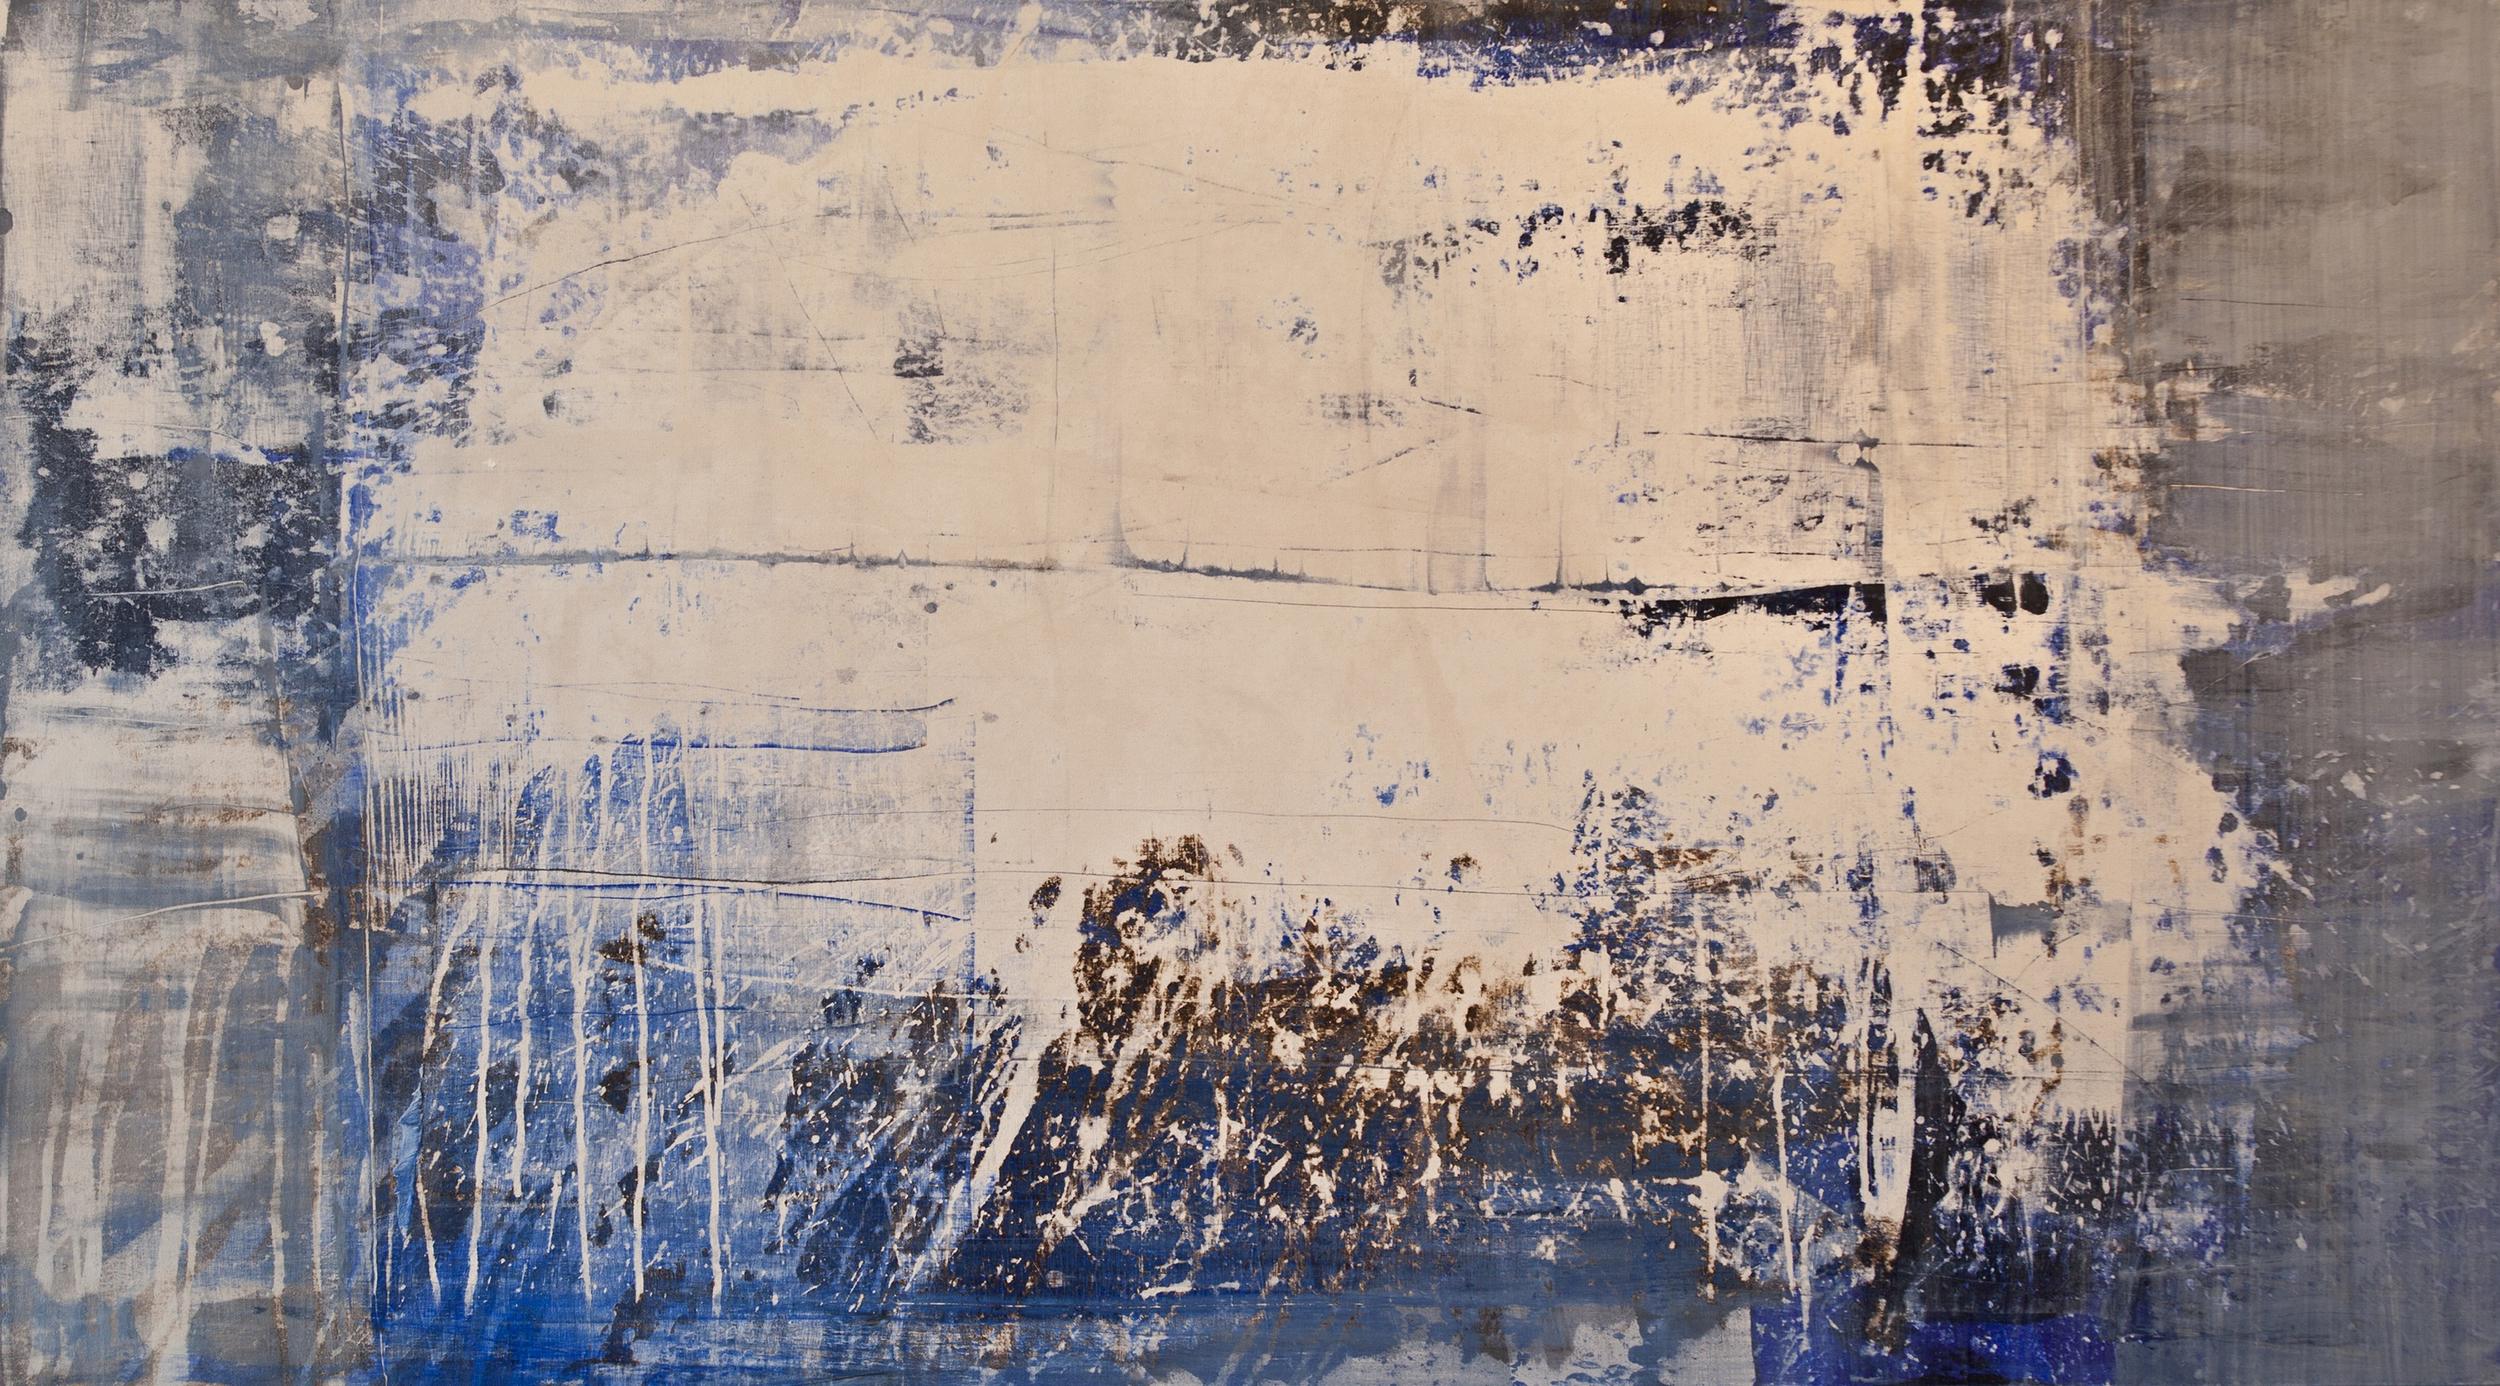 "1186, oil and acrylic on canvas, 2014, 72"" x 40"", $6,000"